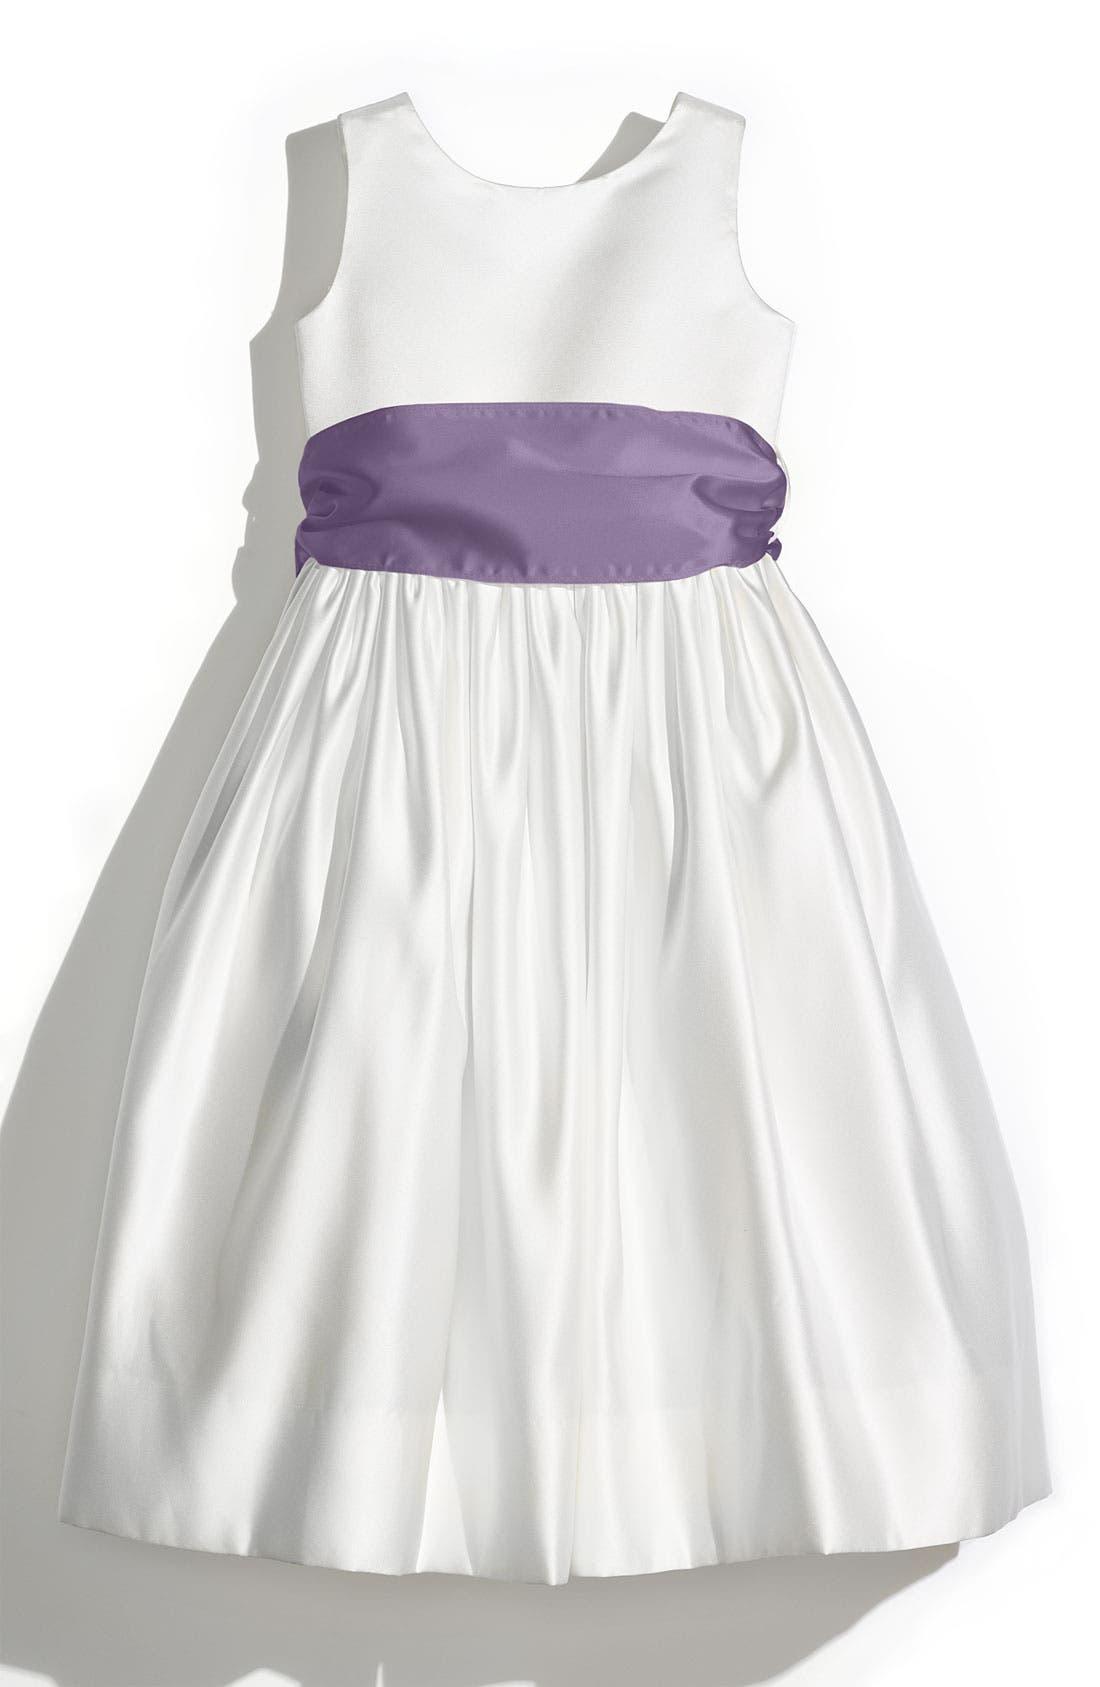 Cute Dresses for Girls